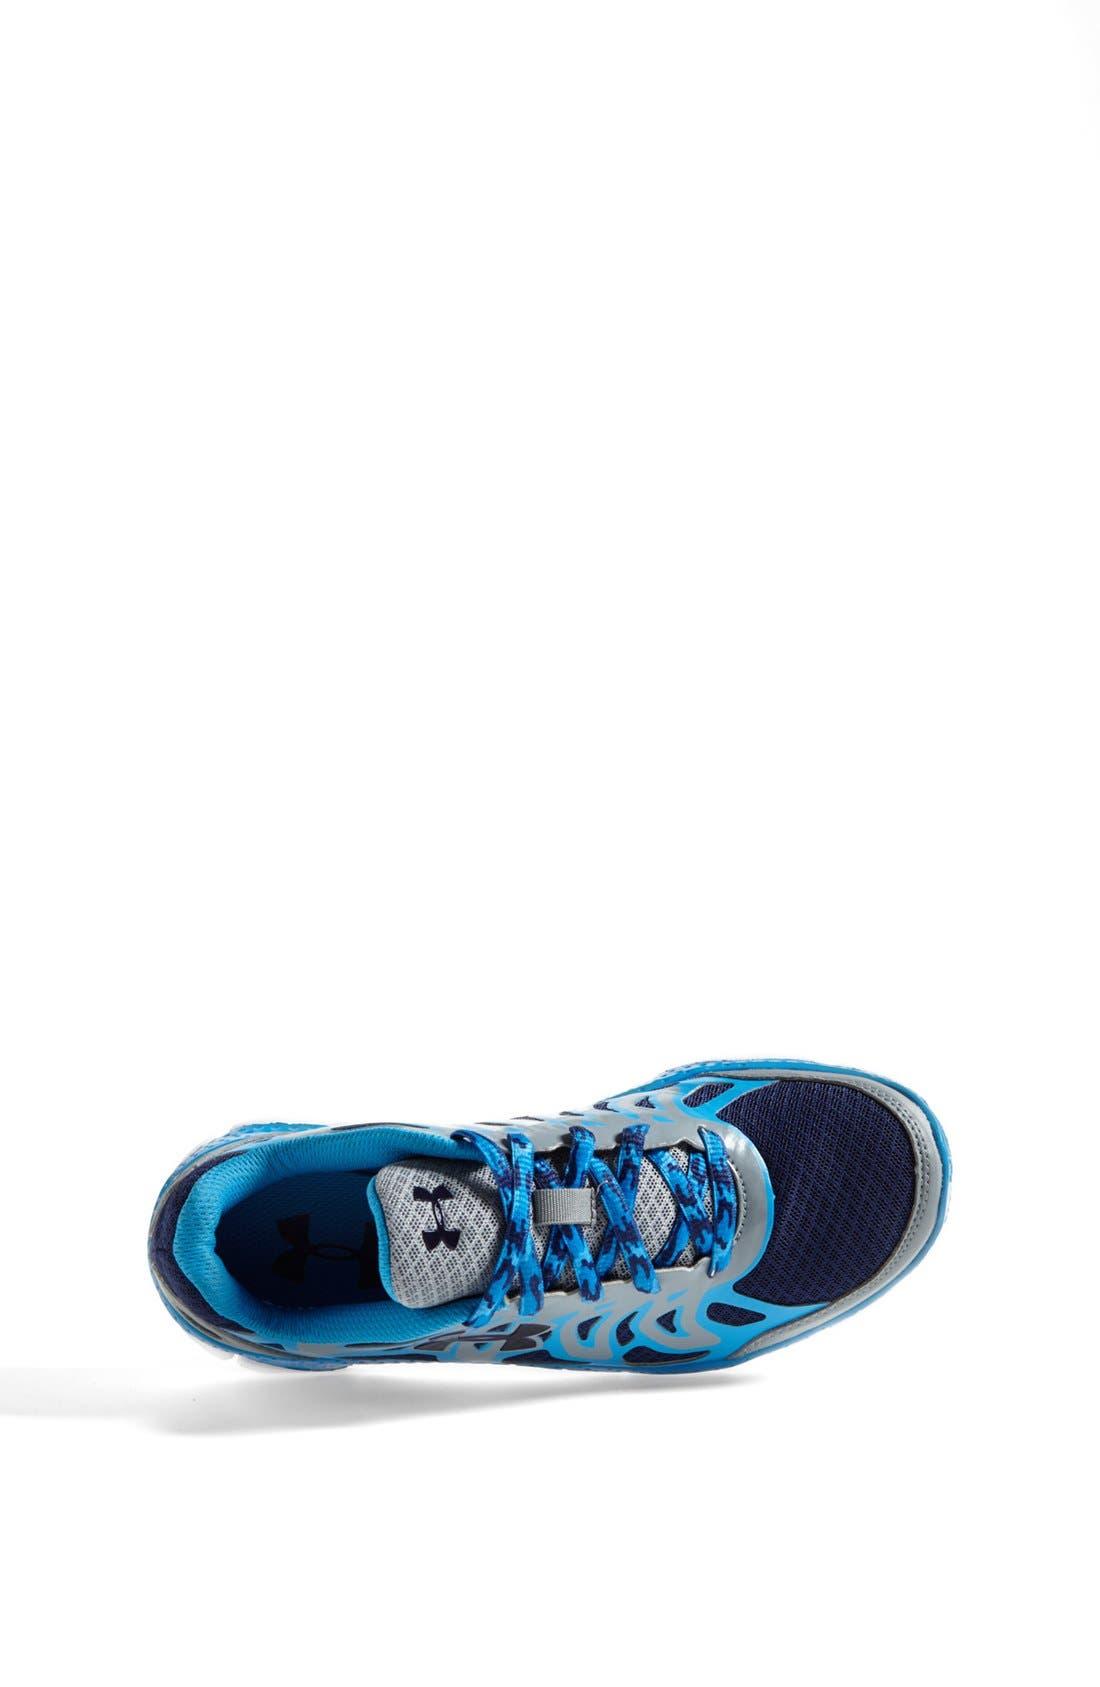 Alternate Image 3  - Under Armour 'Micro G™ Engage' Athletic Shoe (Big Kid)